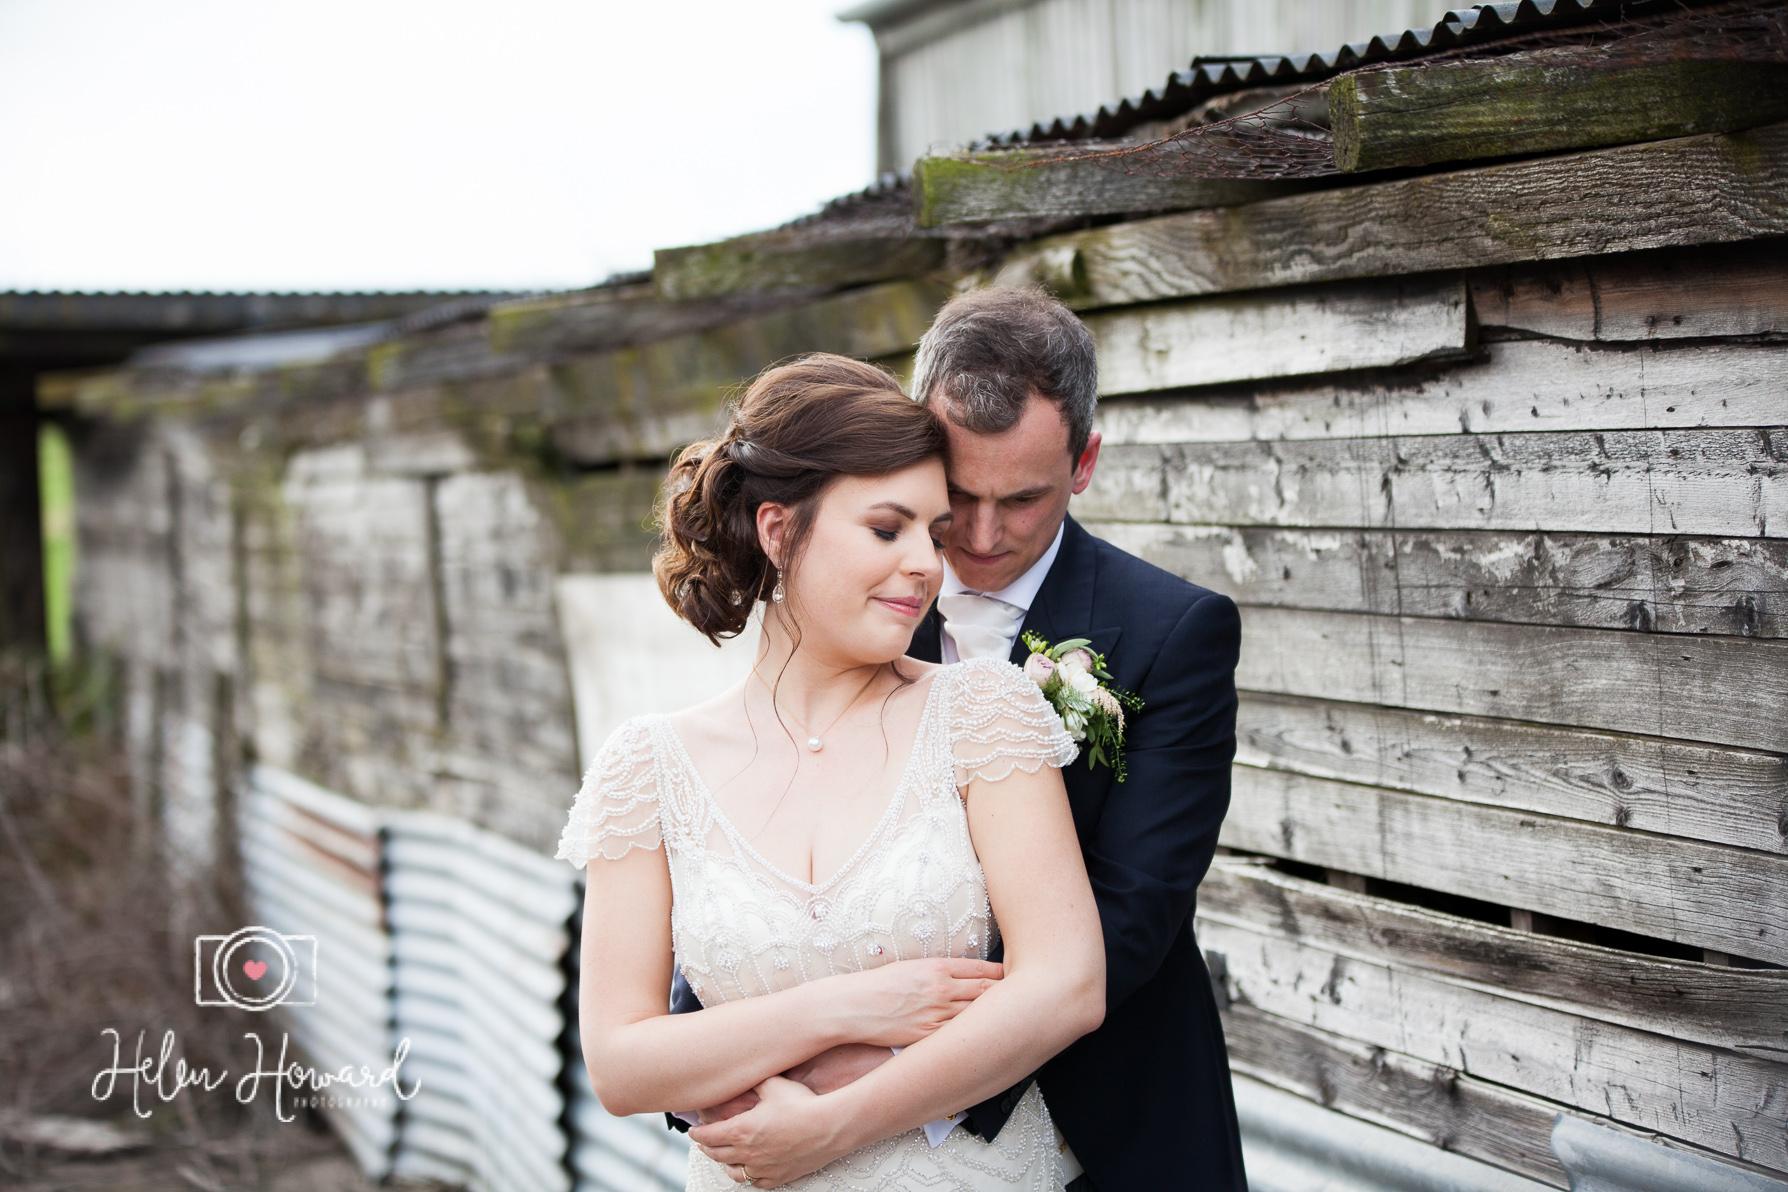 Helen Howard Photography Packington Moor Wedding-106.jpg